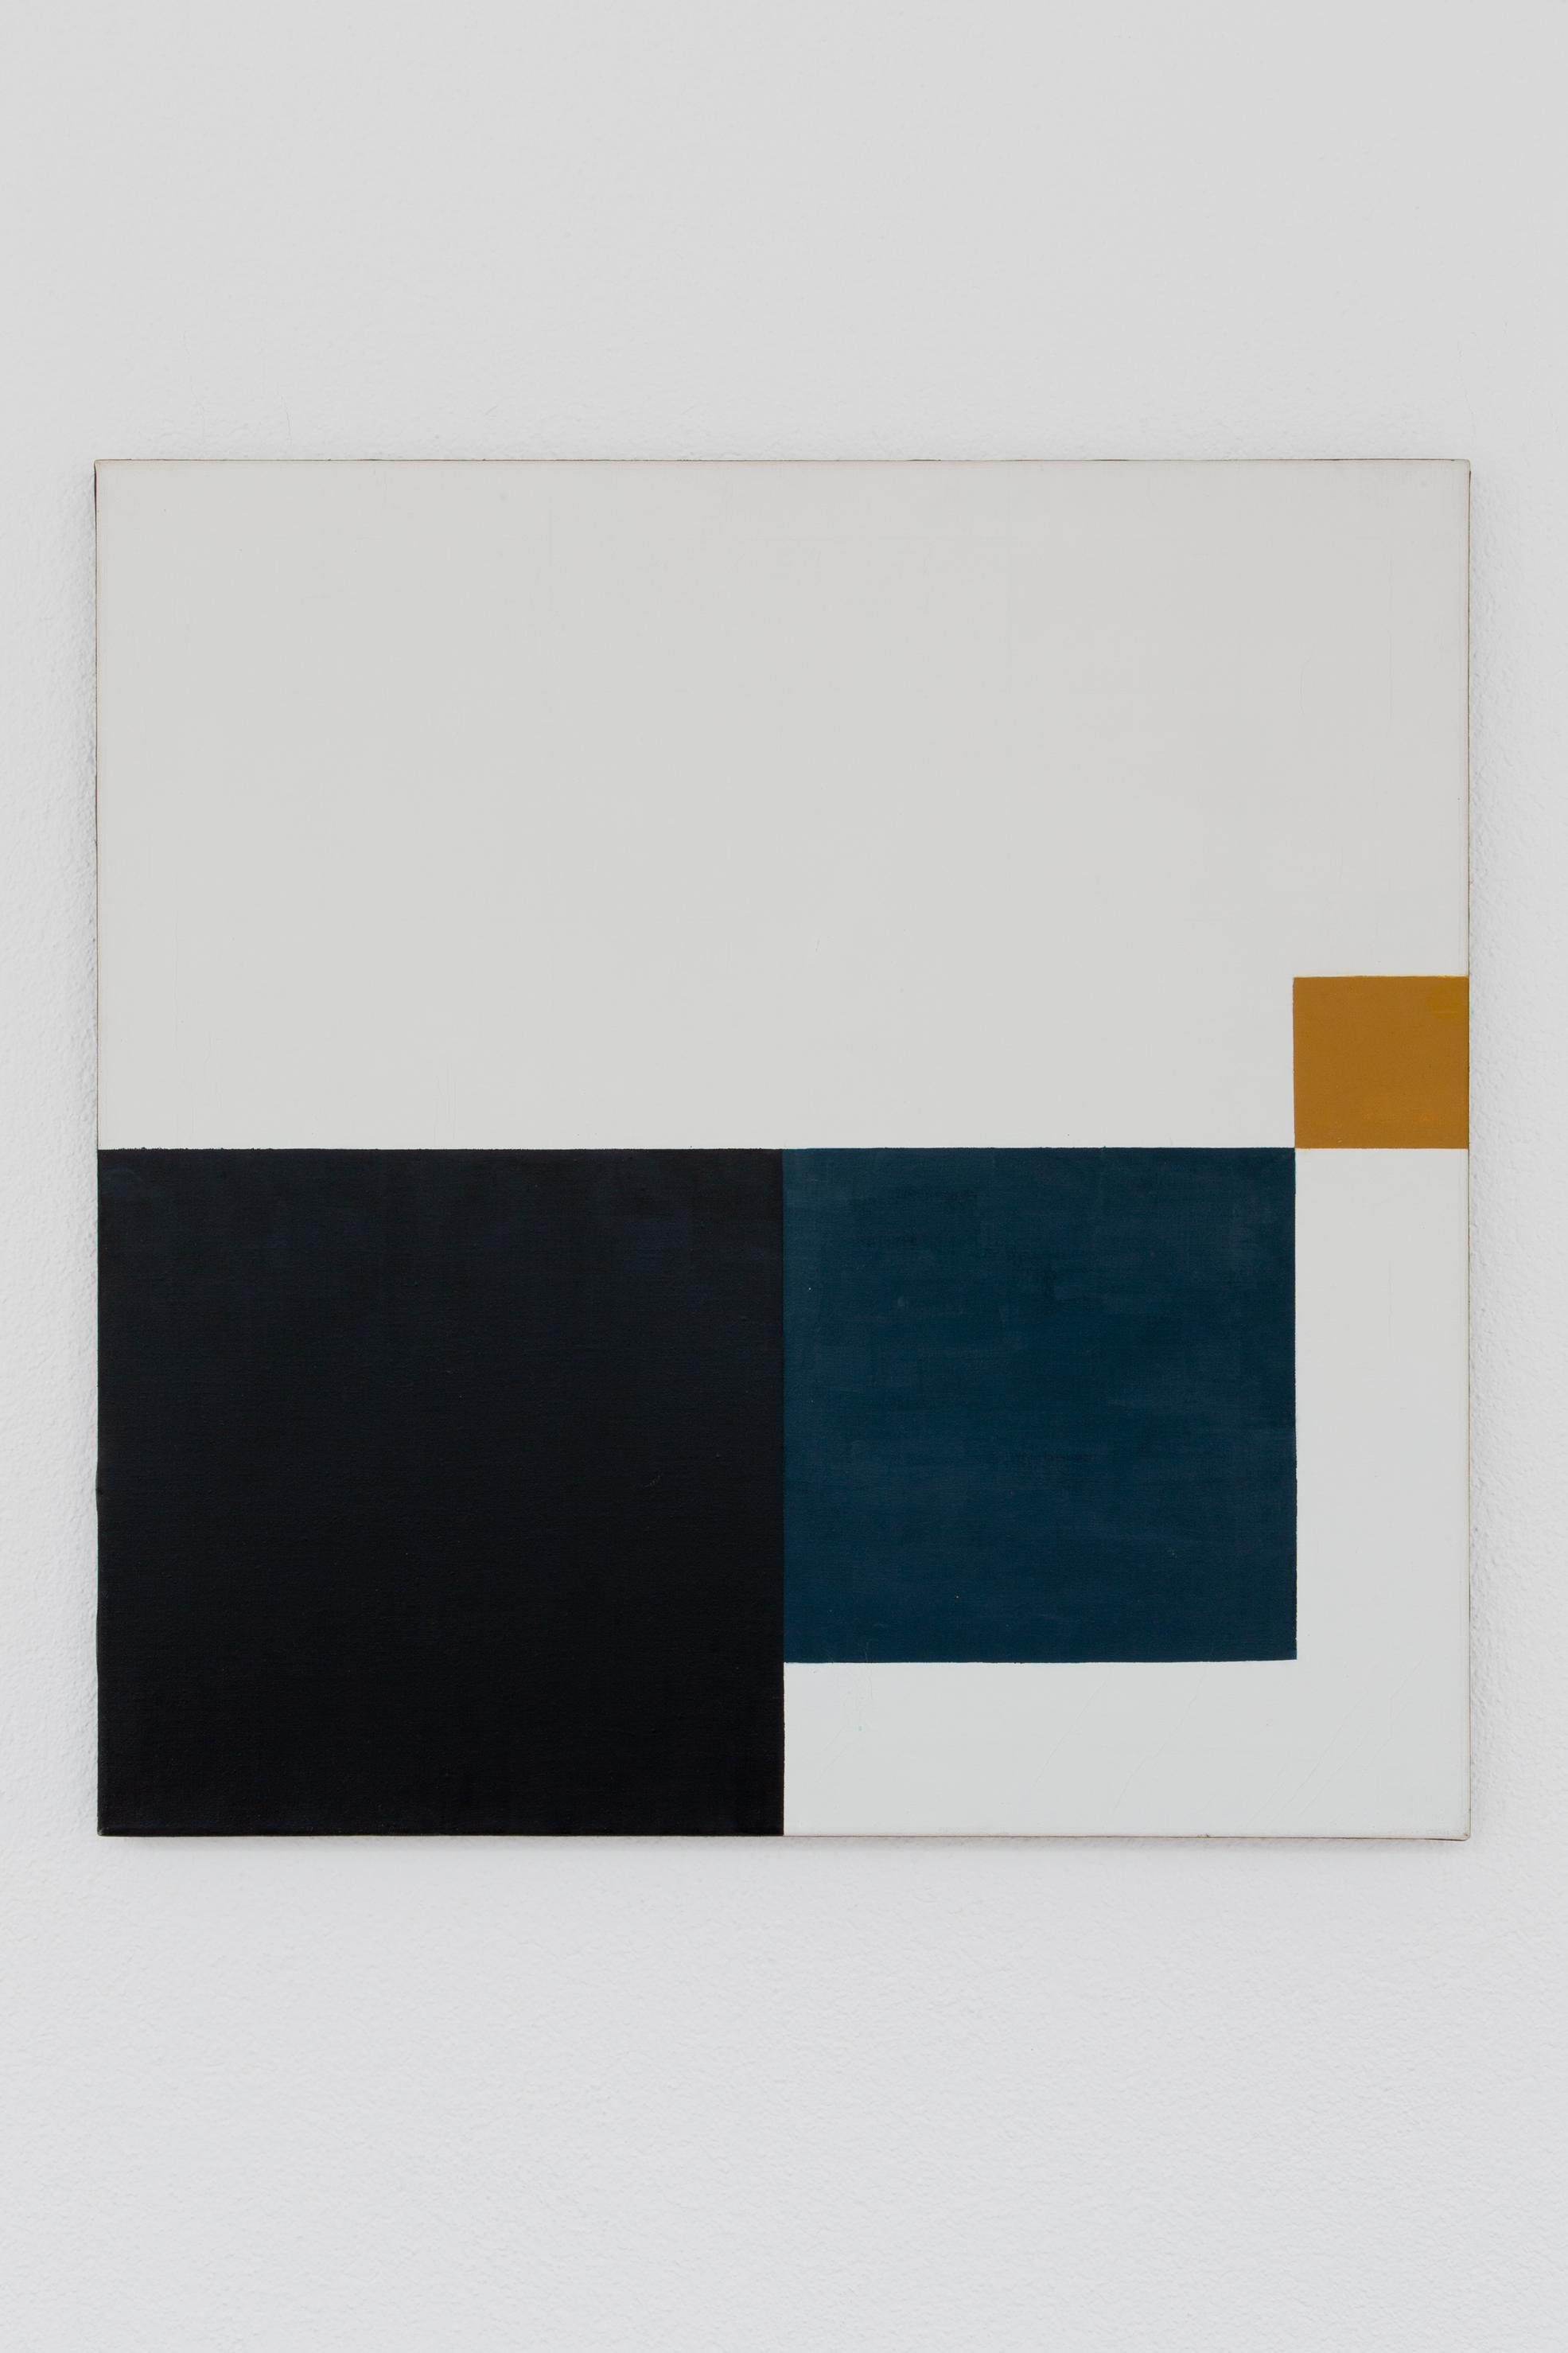 Hedi Mertens,  Ohne Titel , 1977, Öl auf Leinwand, 80 x 80 cm